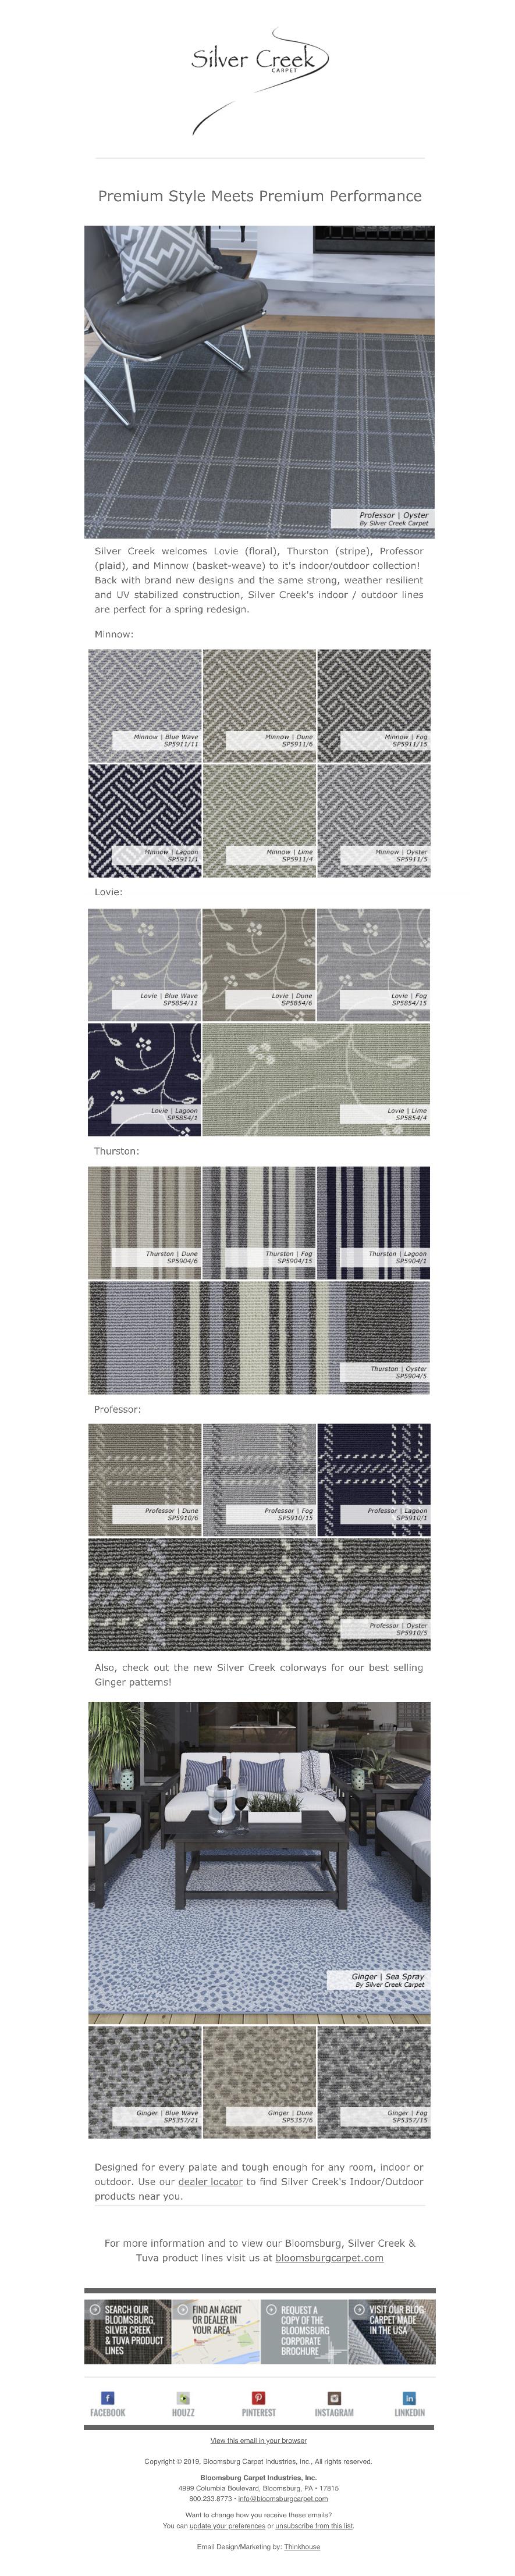 Bloomsburg Carpet | New Post